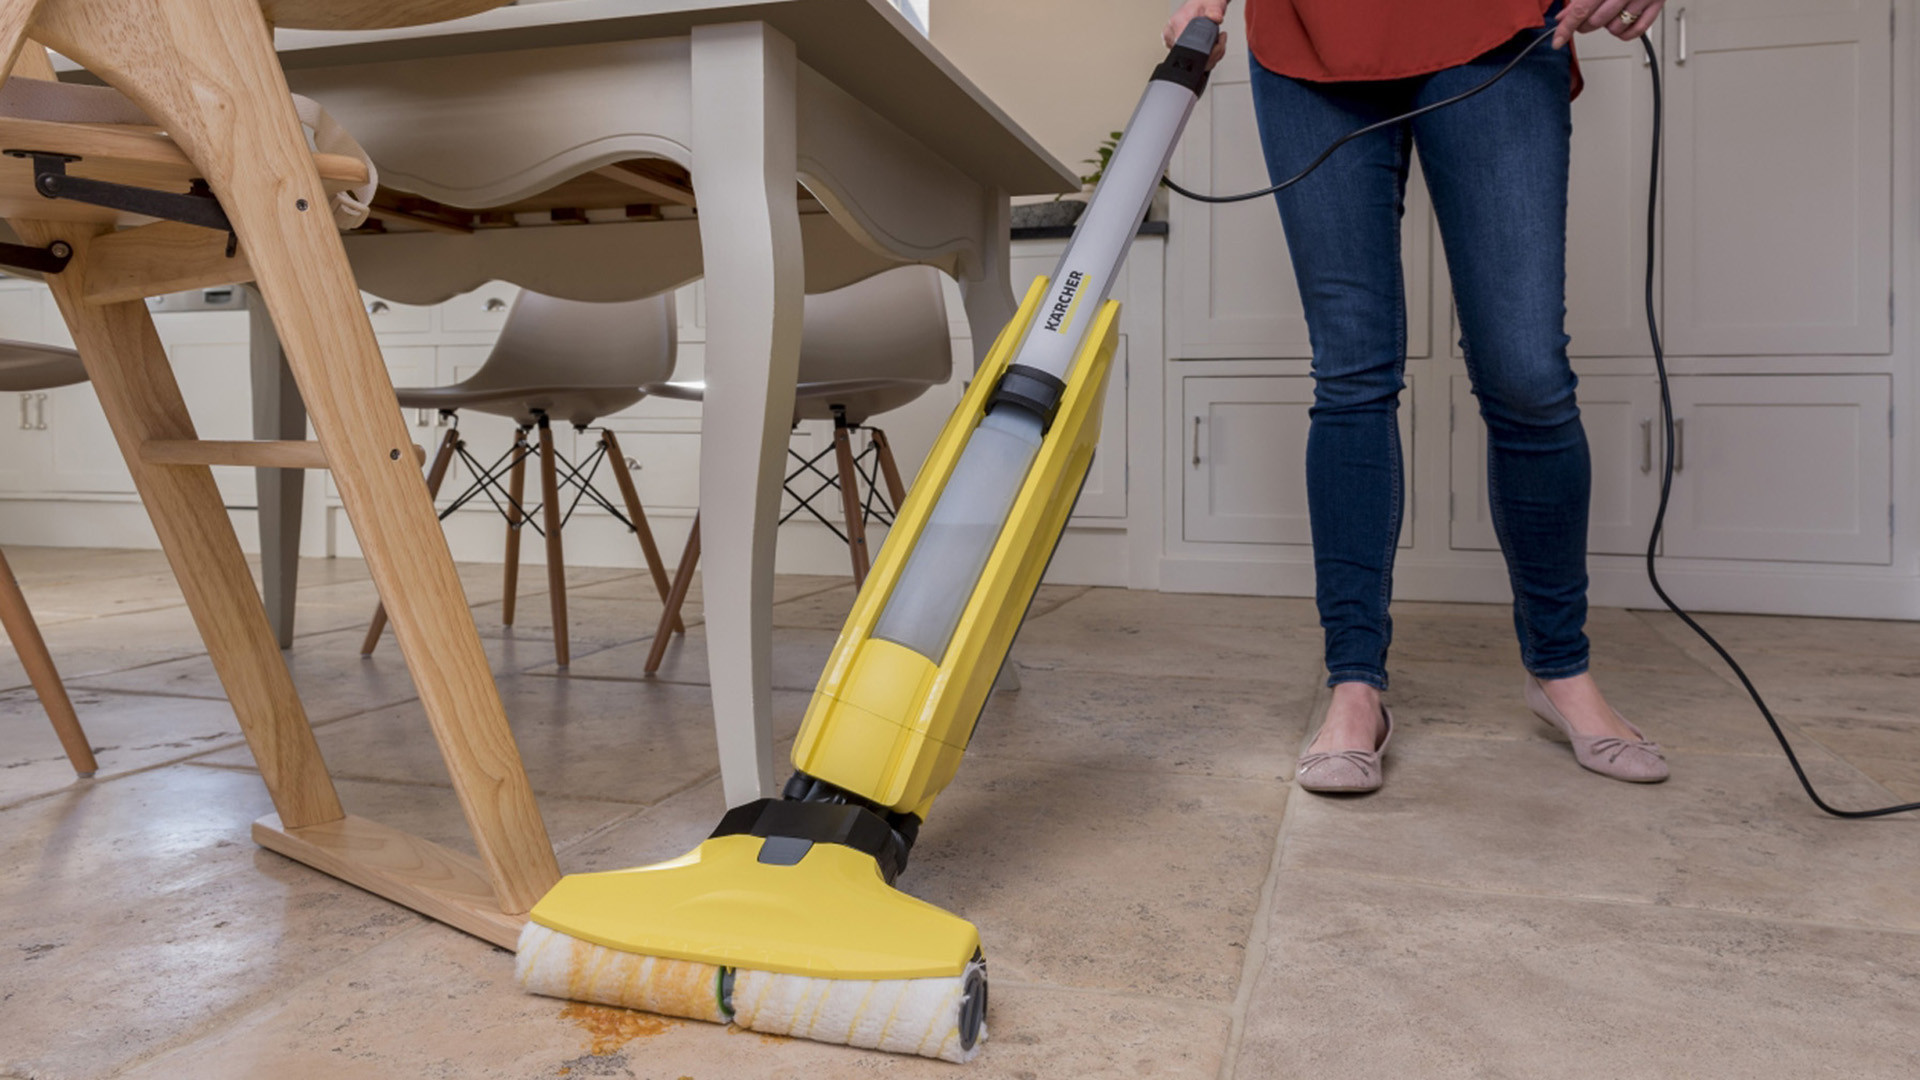 shark steam mop hardwood floor cleaner of karcher fc5 hard floor cleaner review trusted reviews throughout karcher fc5 5 1